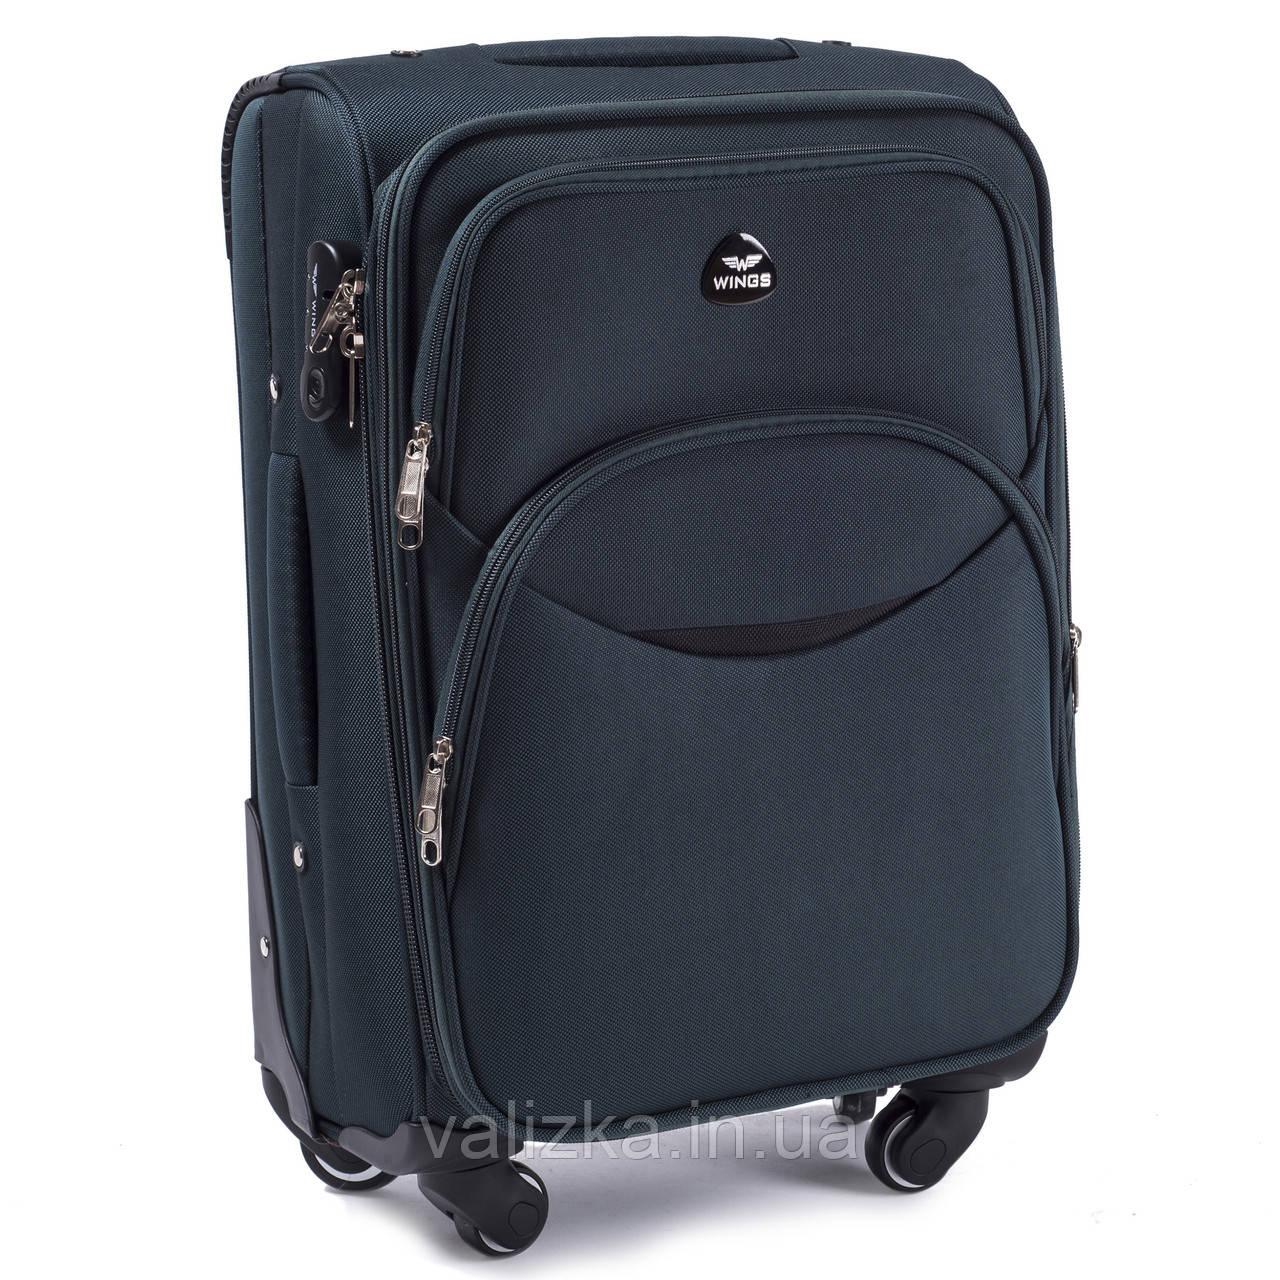 Тканевый чемодан маленький для ручной клади на 4-х колесах Wings 1708 темно-зеленого цвета